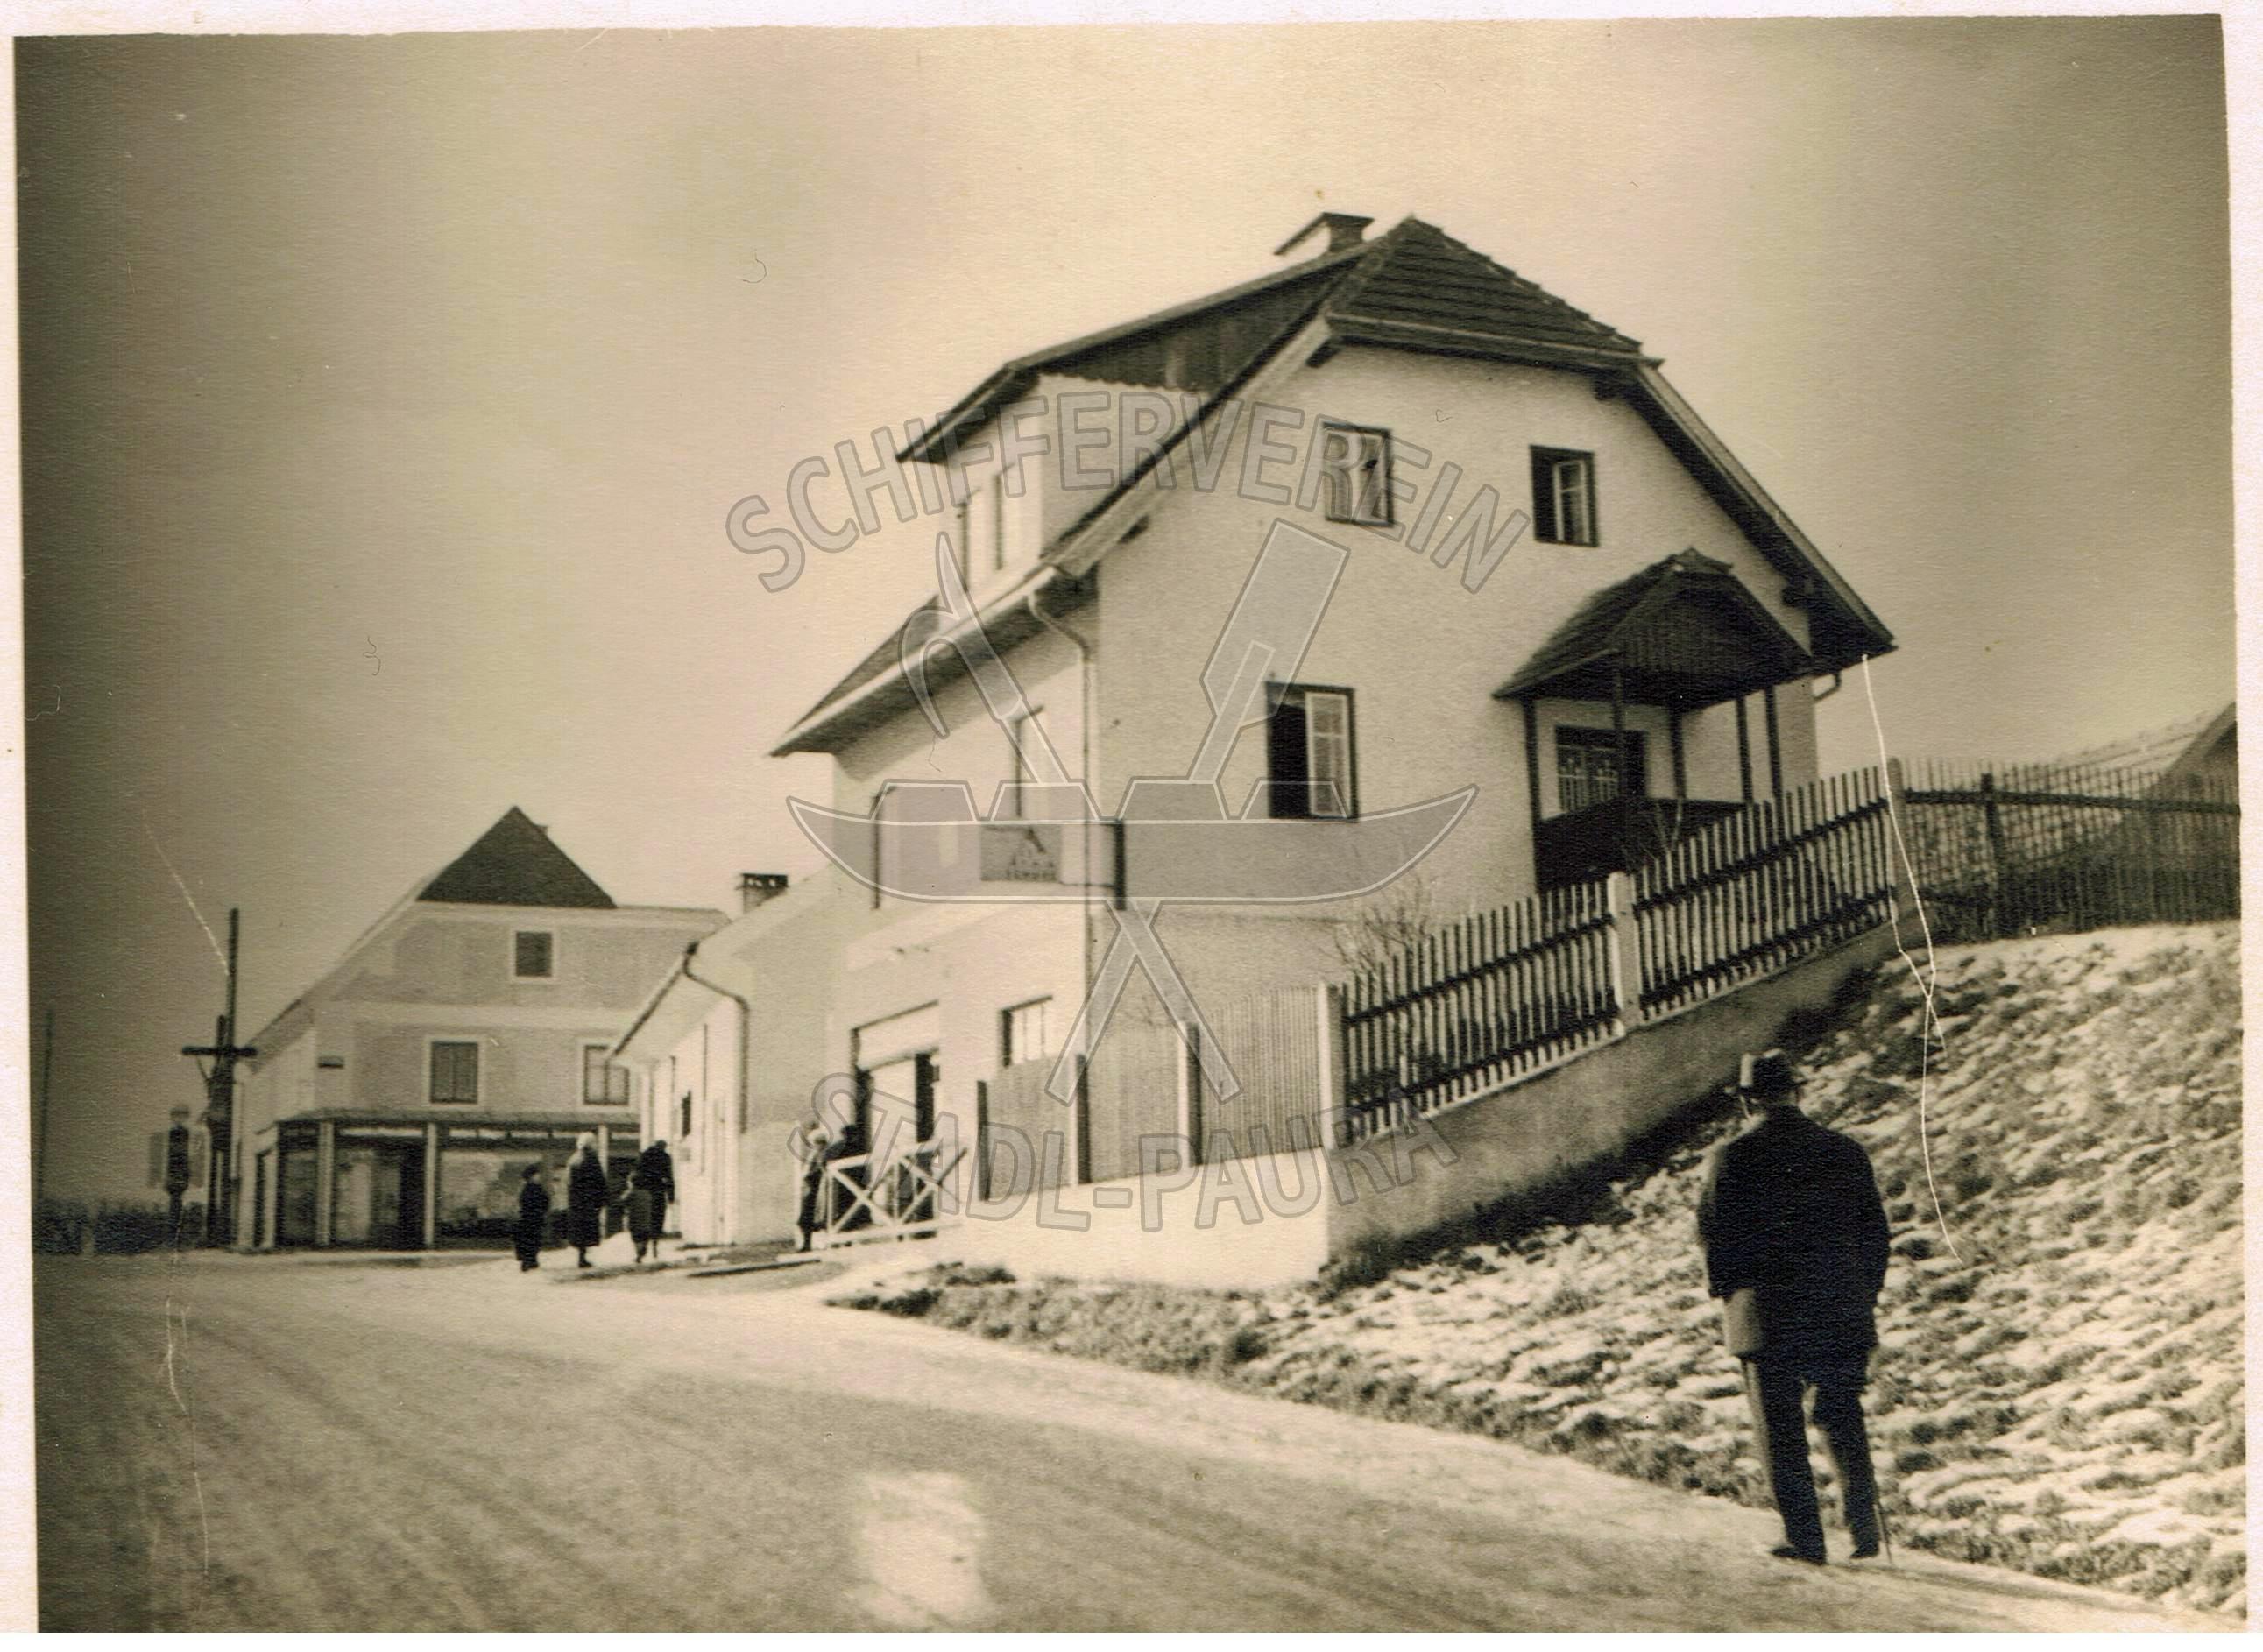 61.1 rechts Schuhwarenlager u. Werkstätte Felleitner, dahinter Kaufhaus Hager Konradwz